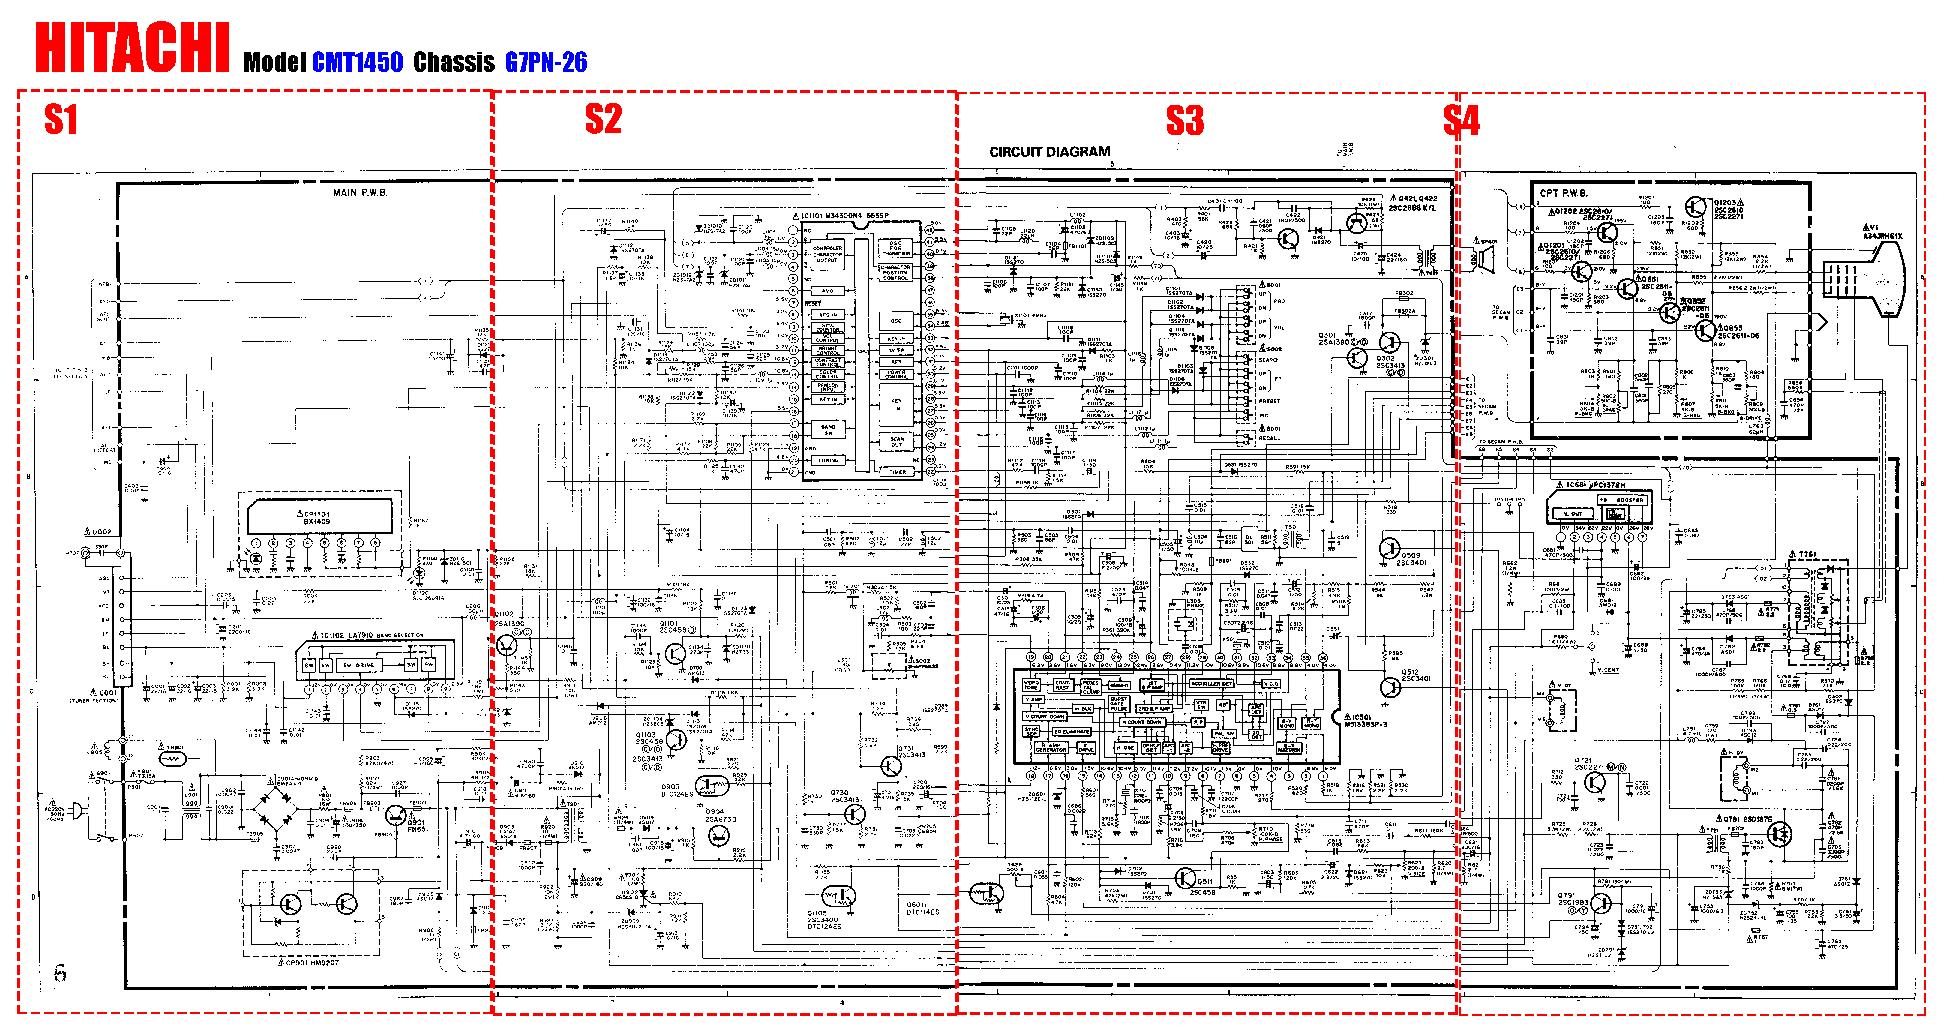 Схему телевизора хитачи